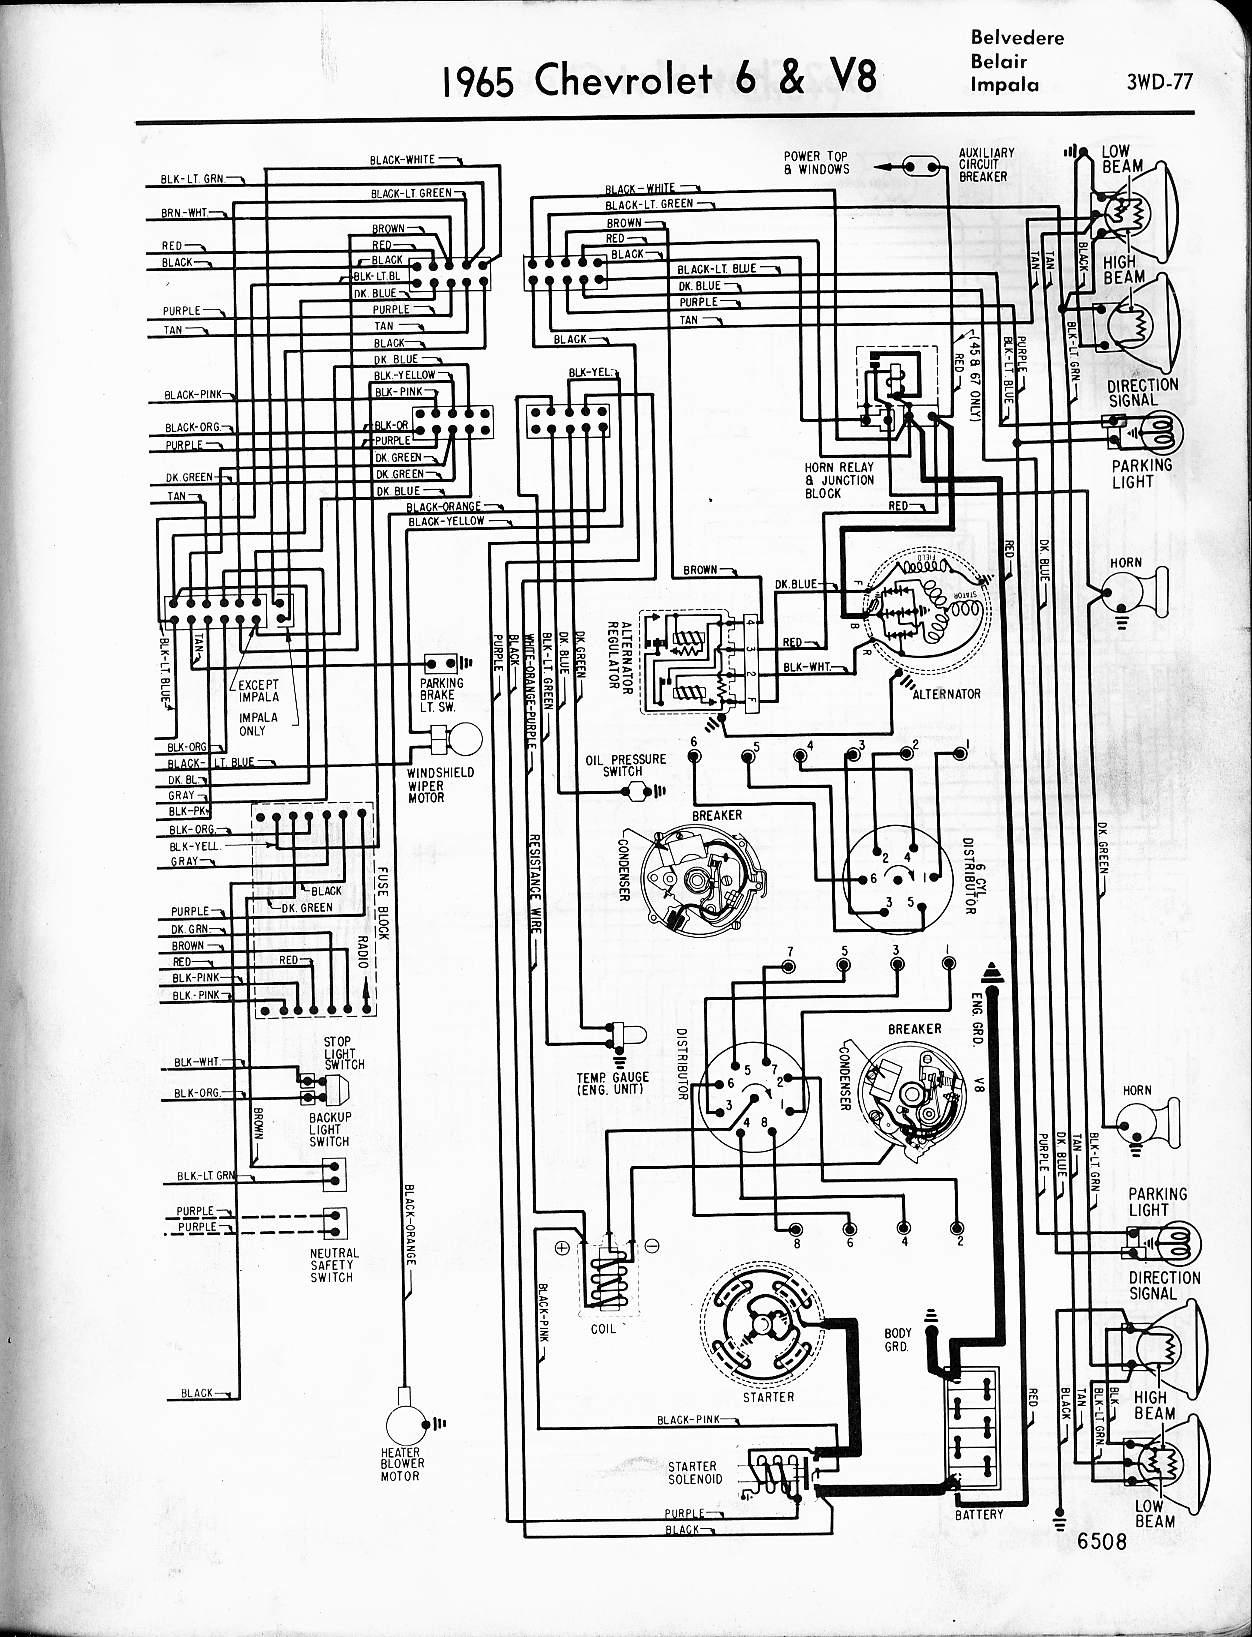 Magnificent 1967 Chevelle Wiring Diagram Basic Electronics Wiring Diagram Wiring Cloud Hisonepsysticxongrecoveryedborg